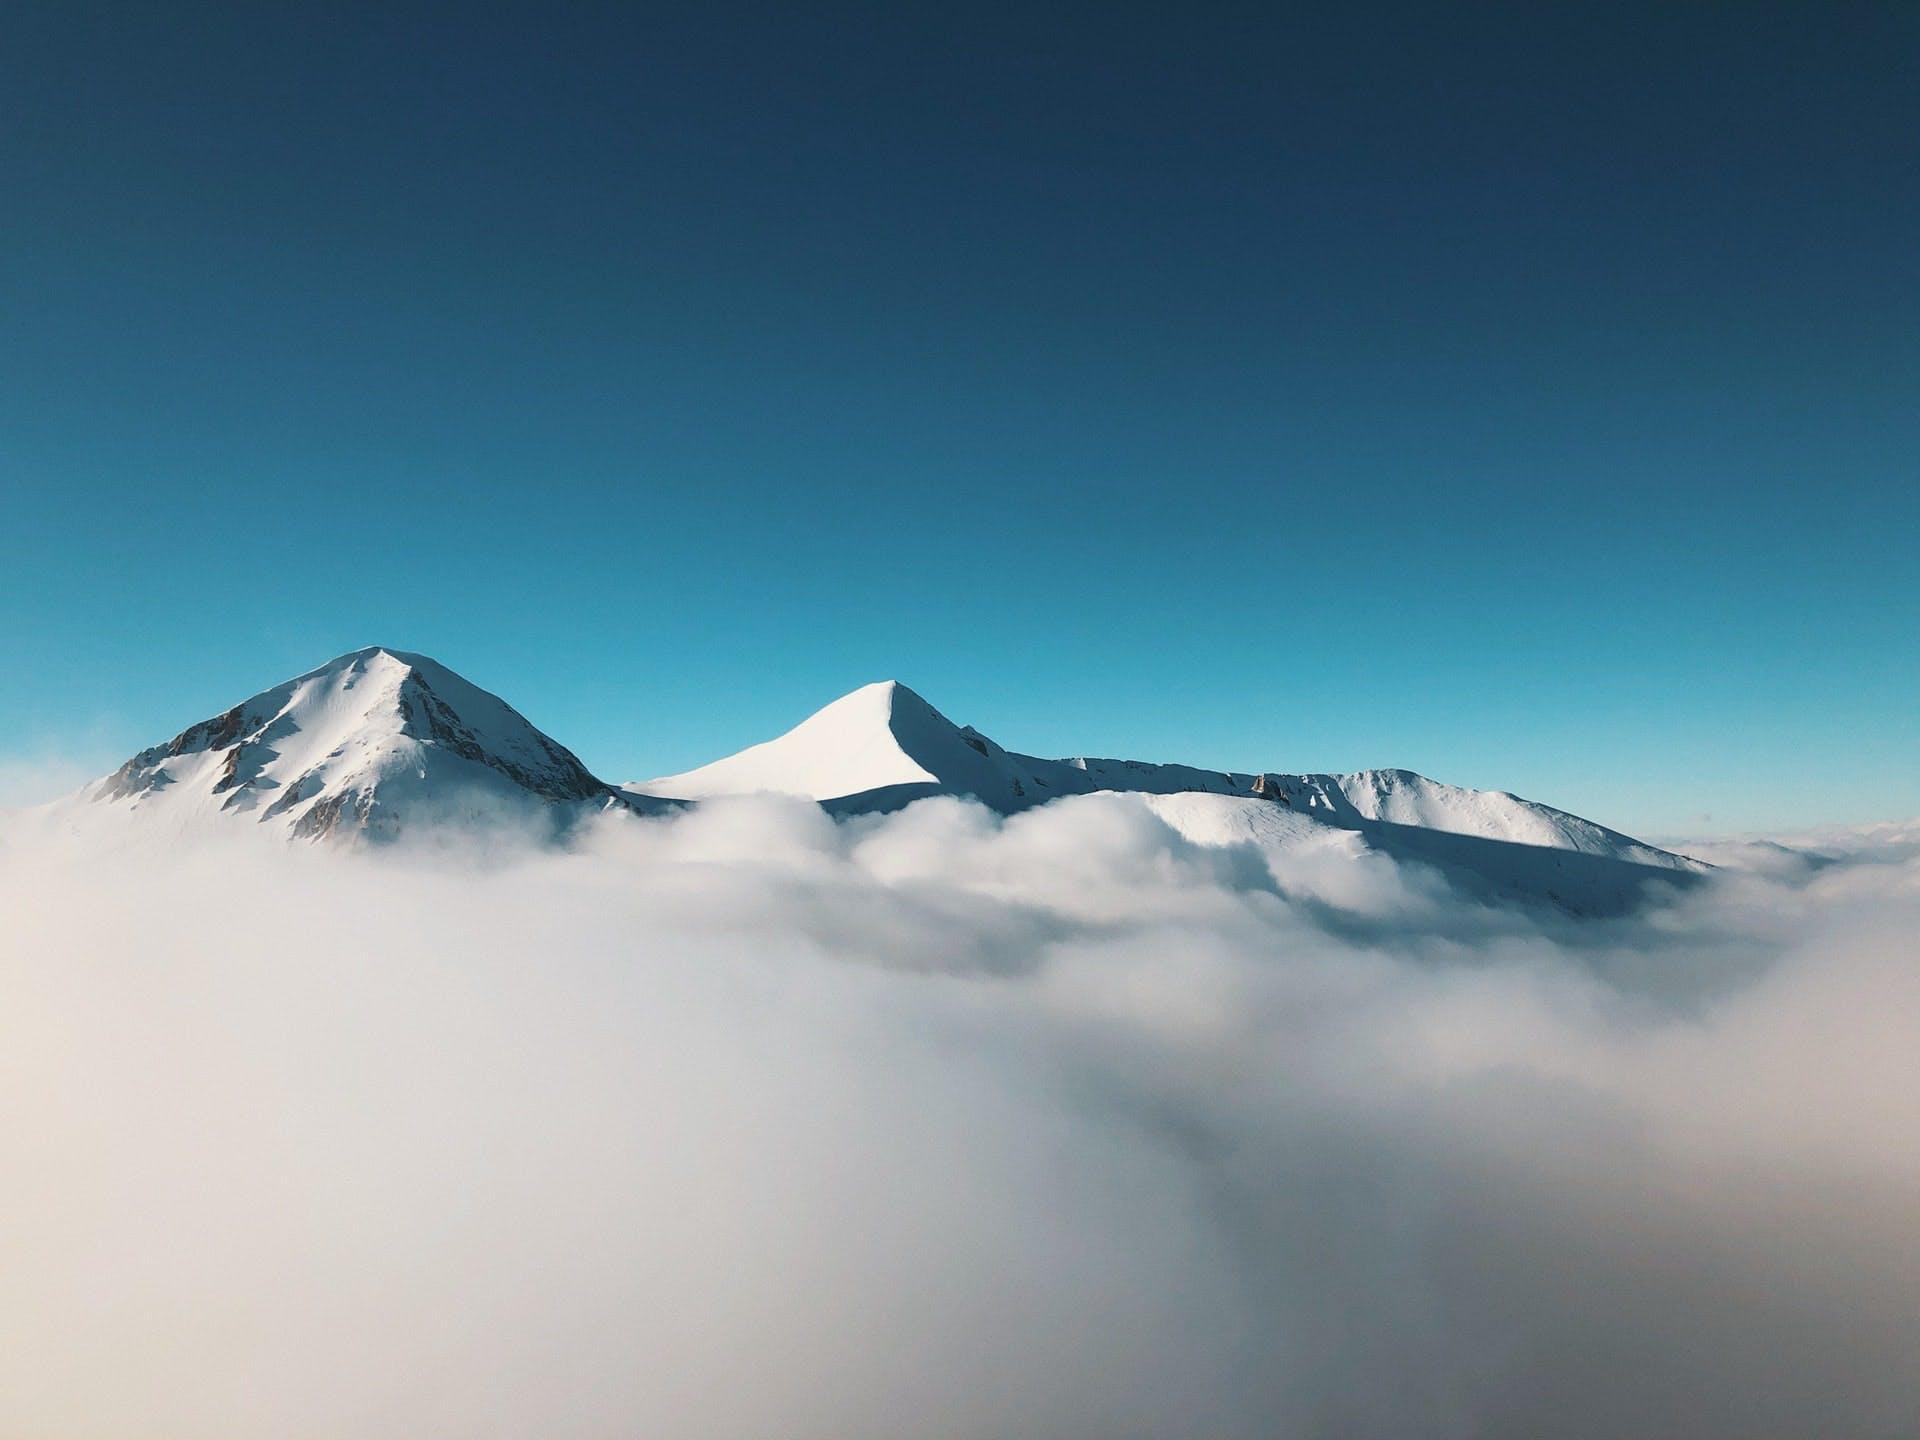 Beste Tijd Om Te Skien In Bulgarije - Ridestore Magazine